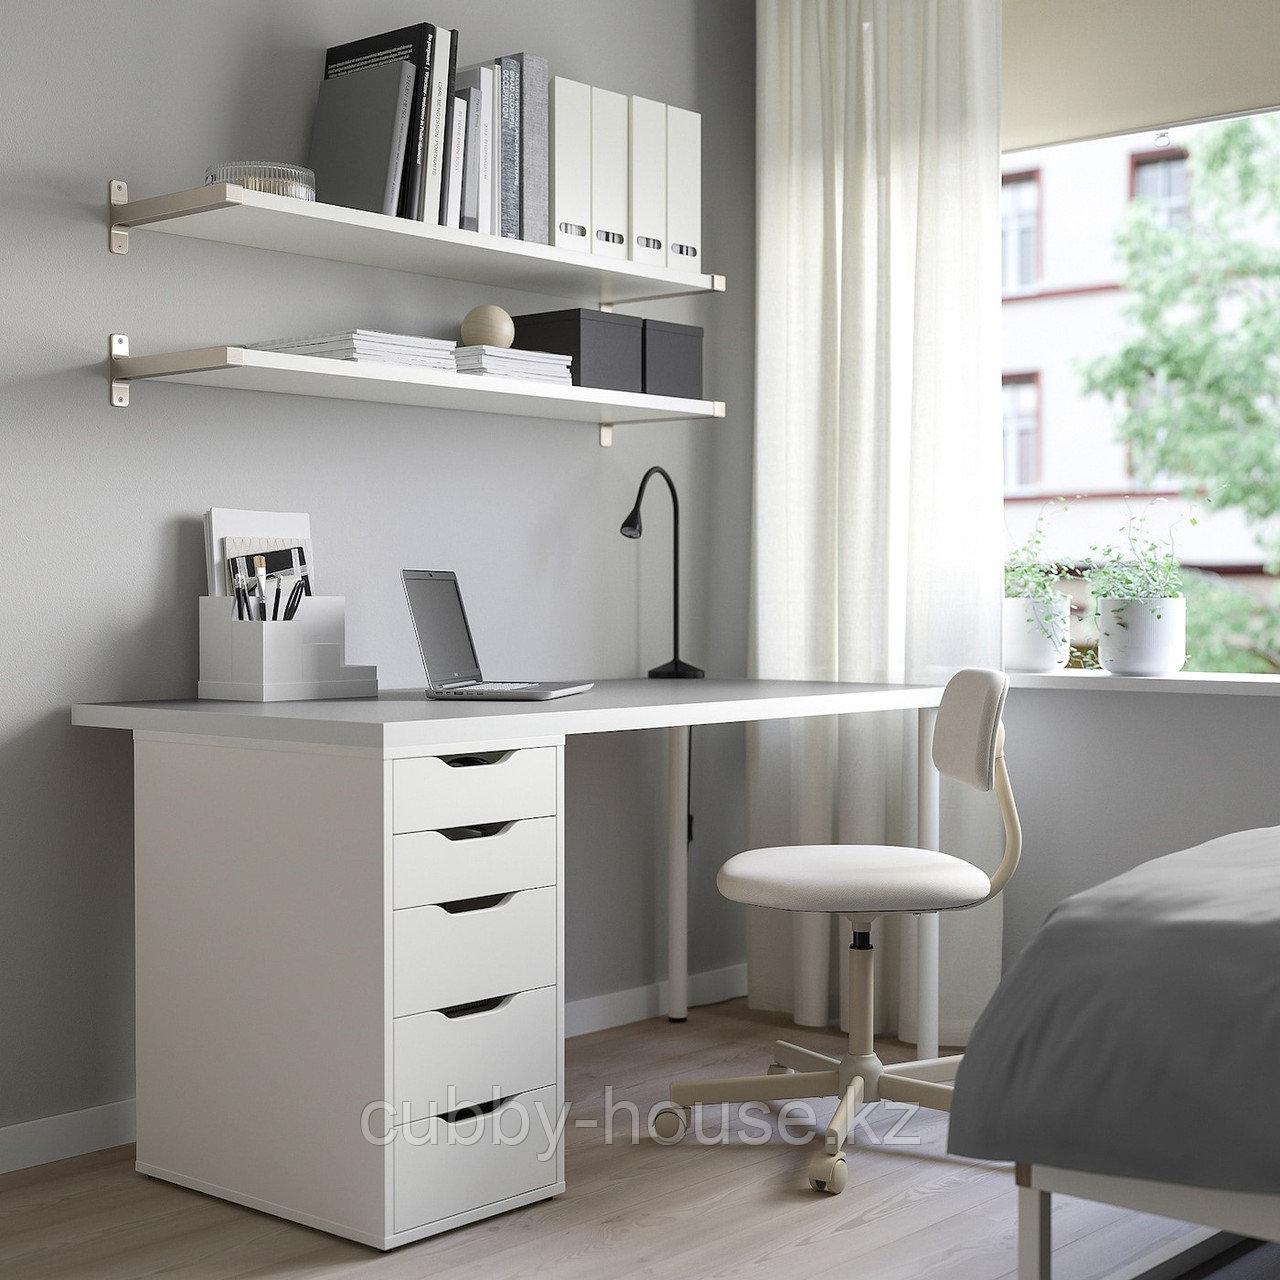 ЛИННМОН / АЛЕКС Стол, светло-серый, белый, 150x75 см